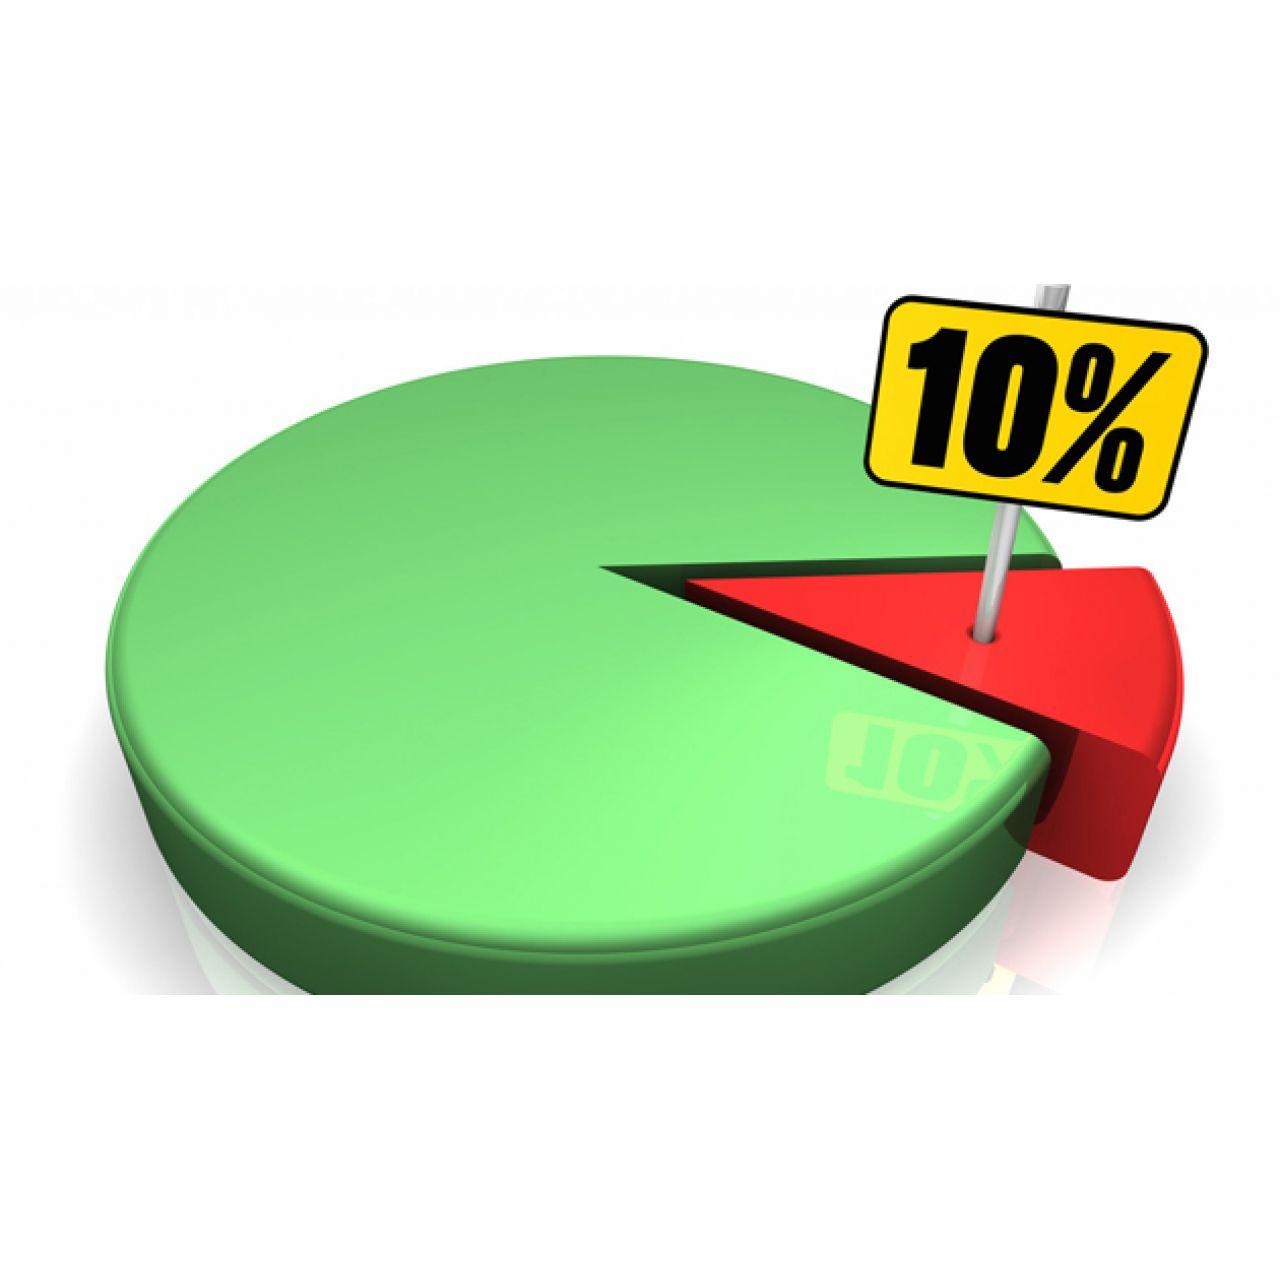 Предоплата из категории Оплата для CMS OpenCart (ОпенКарт)